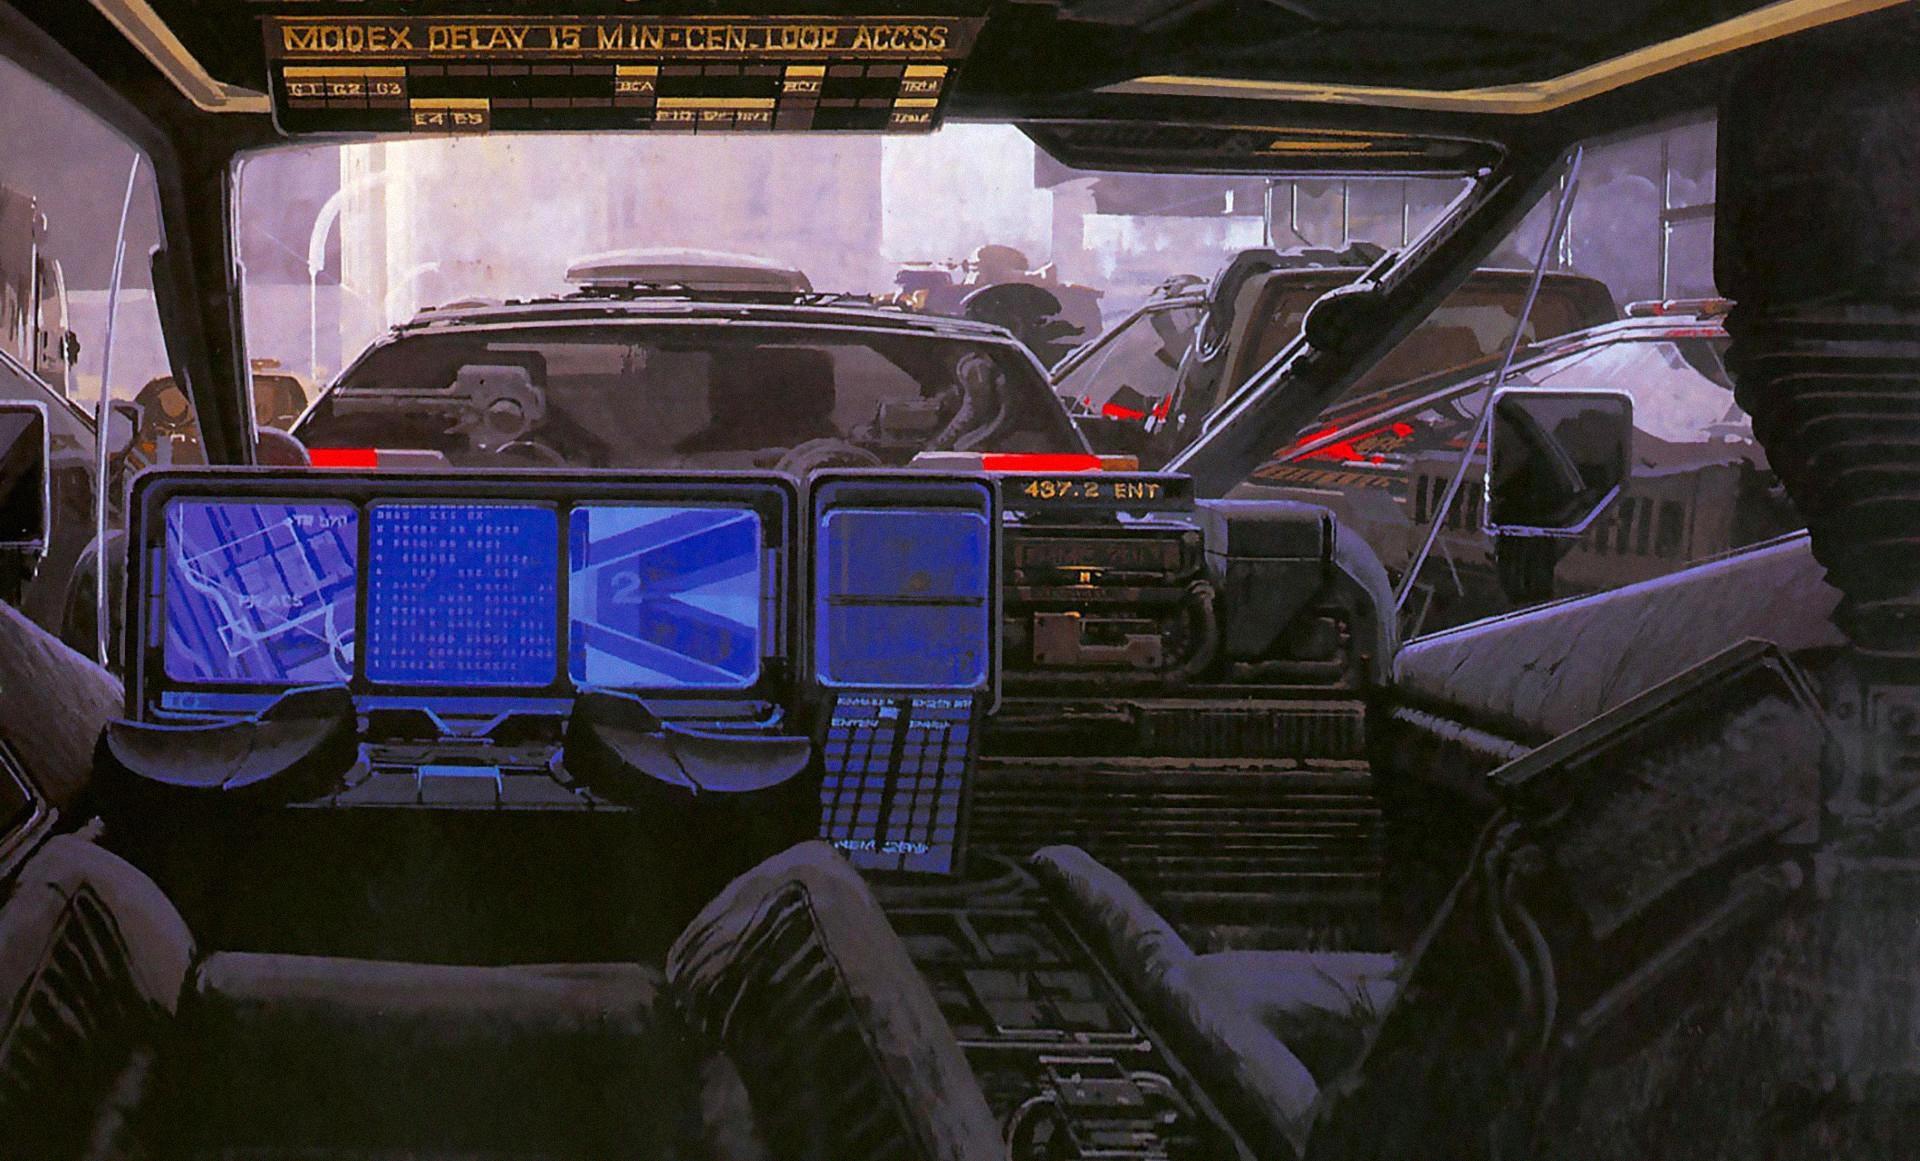 Кино, автопилот и батарейки: какими будут автомобили через 10-20 лет?. Фото 3